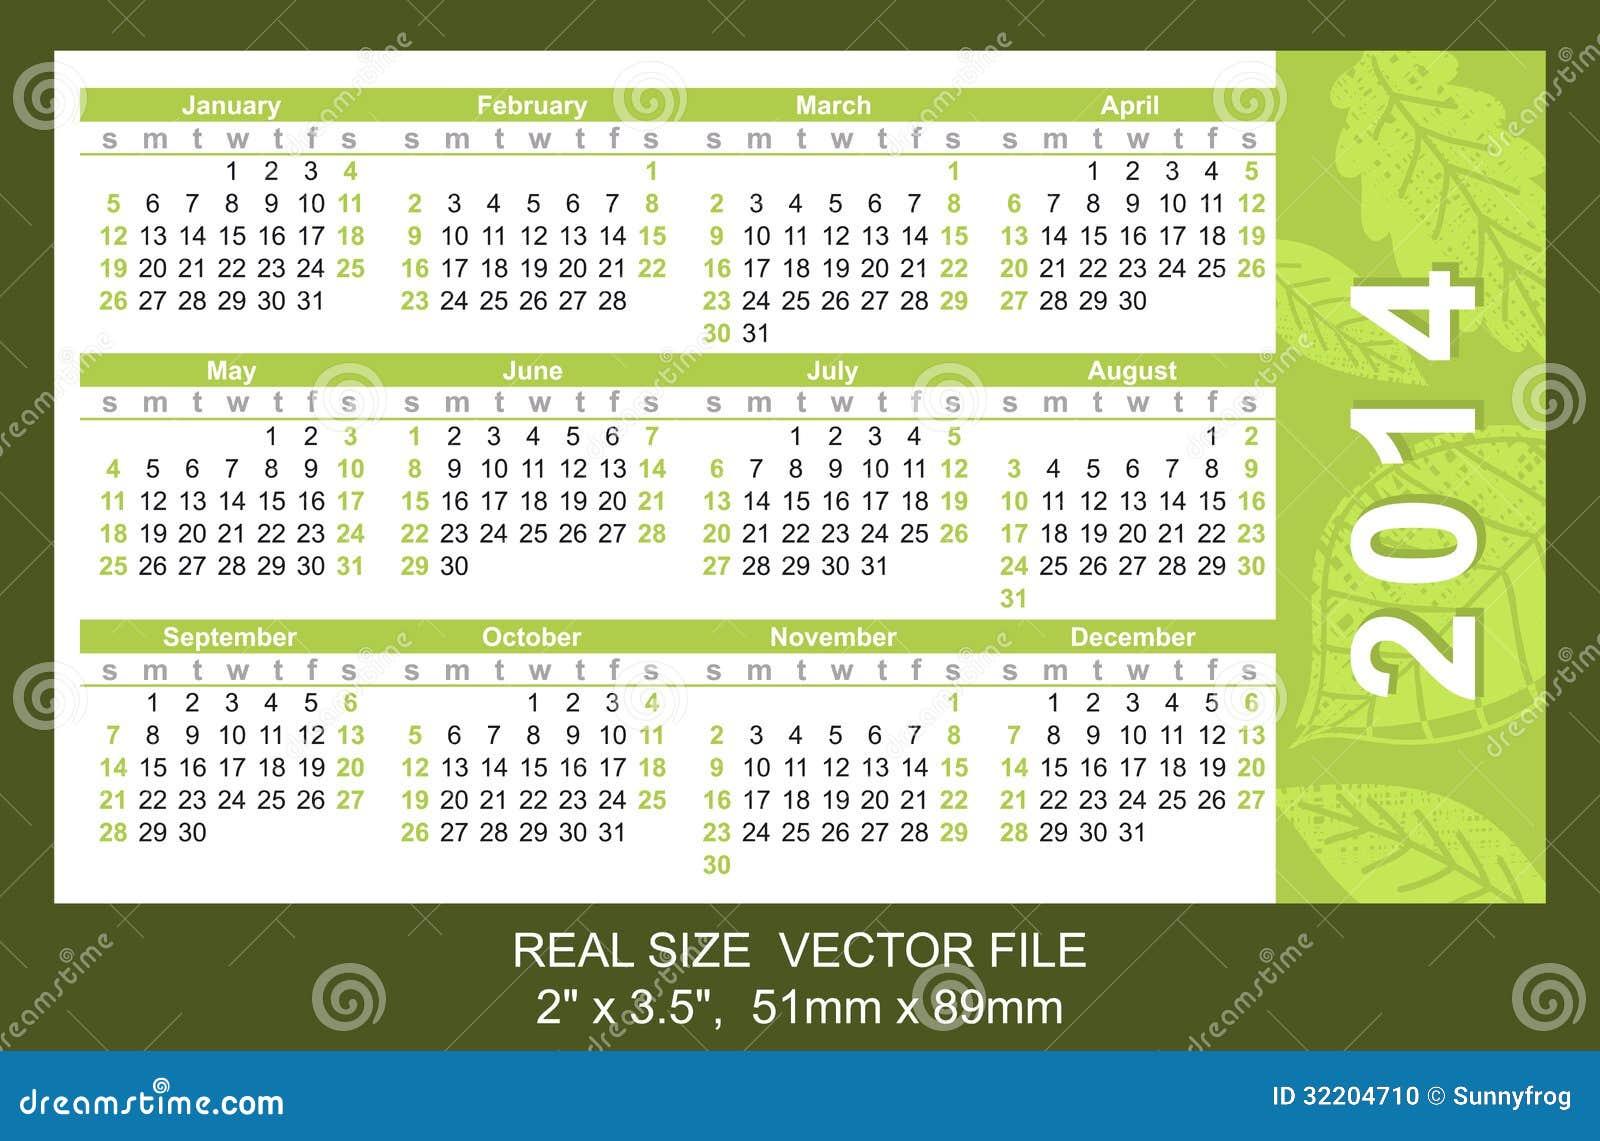 Pocket Calendar 2014, vector, start on SundaySIZE: 2 x 3.5, 51mm x